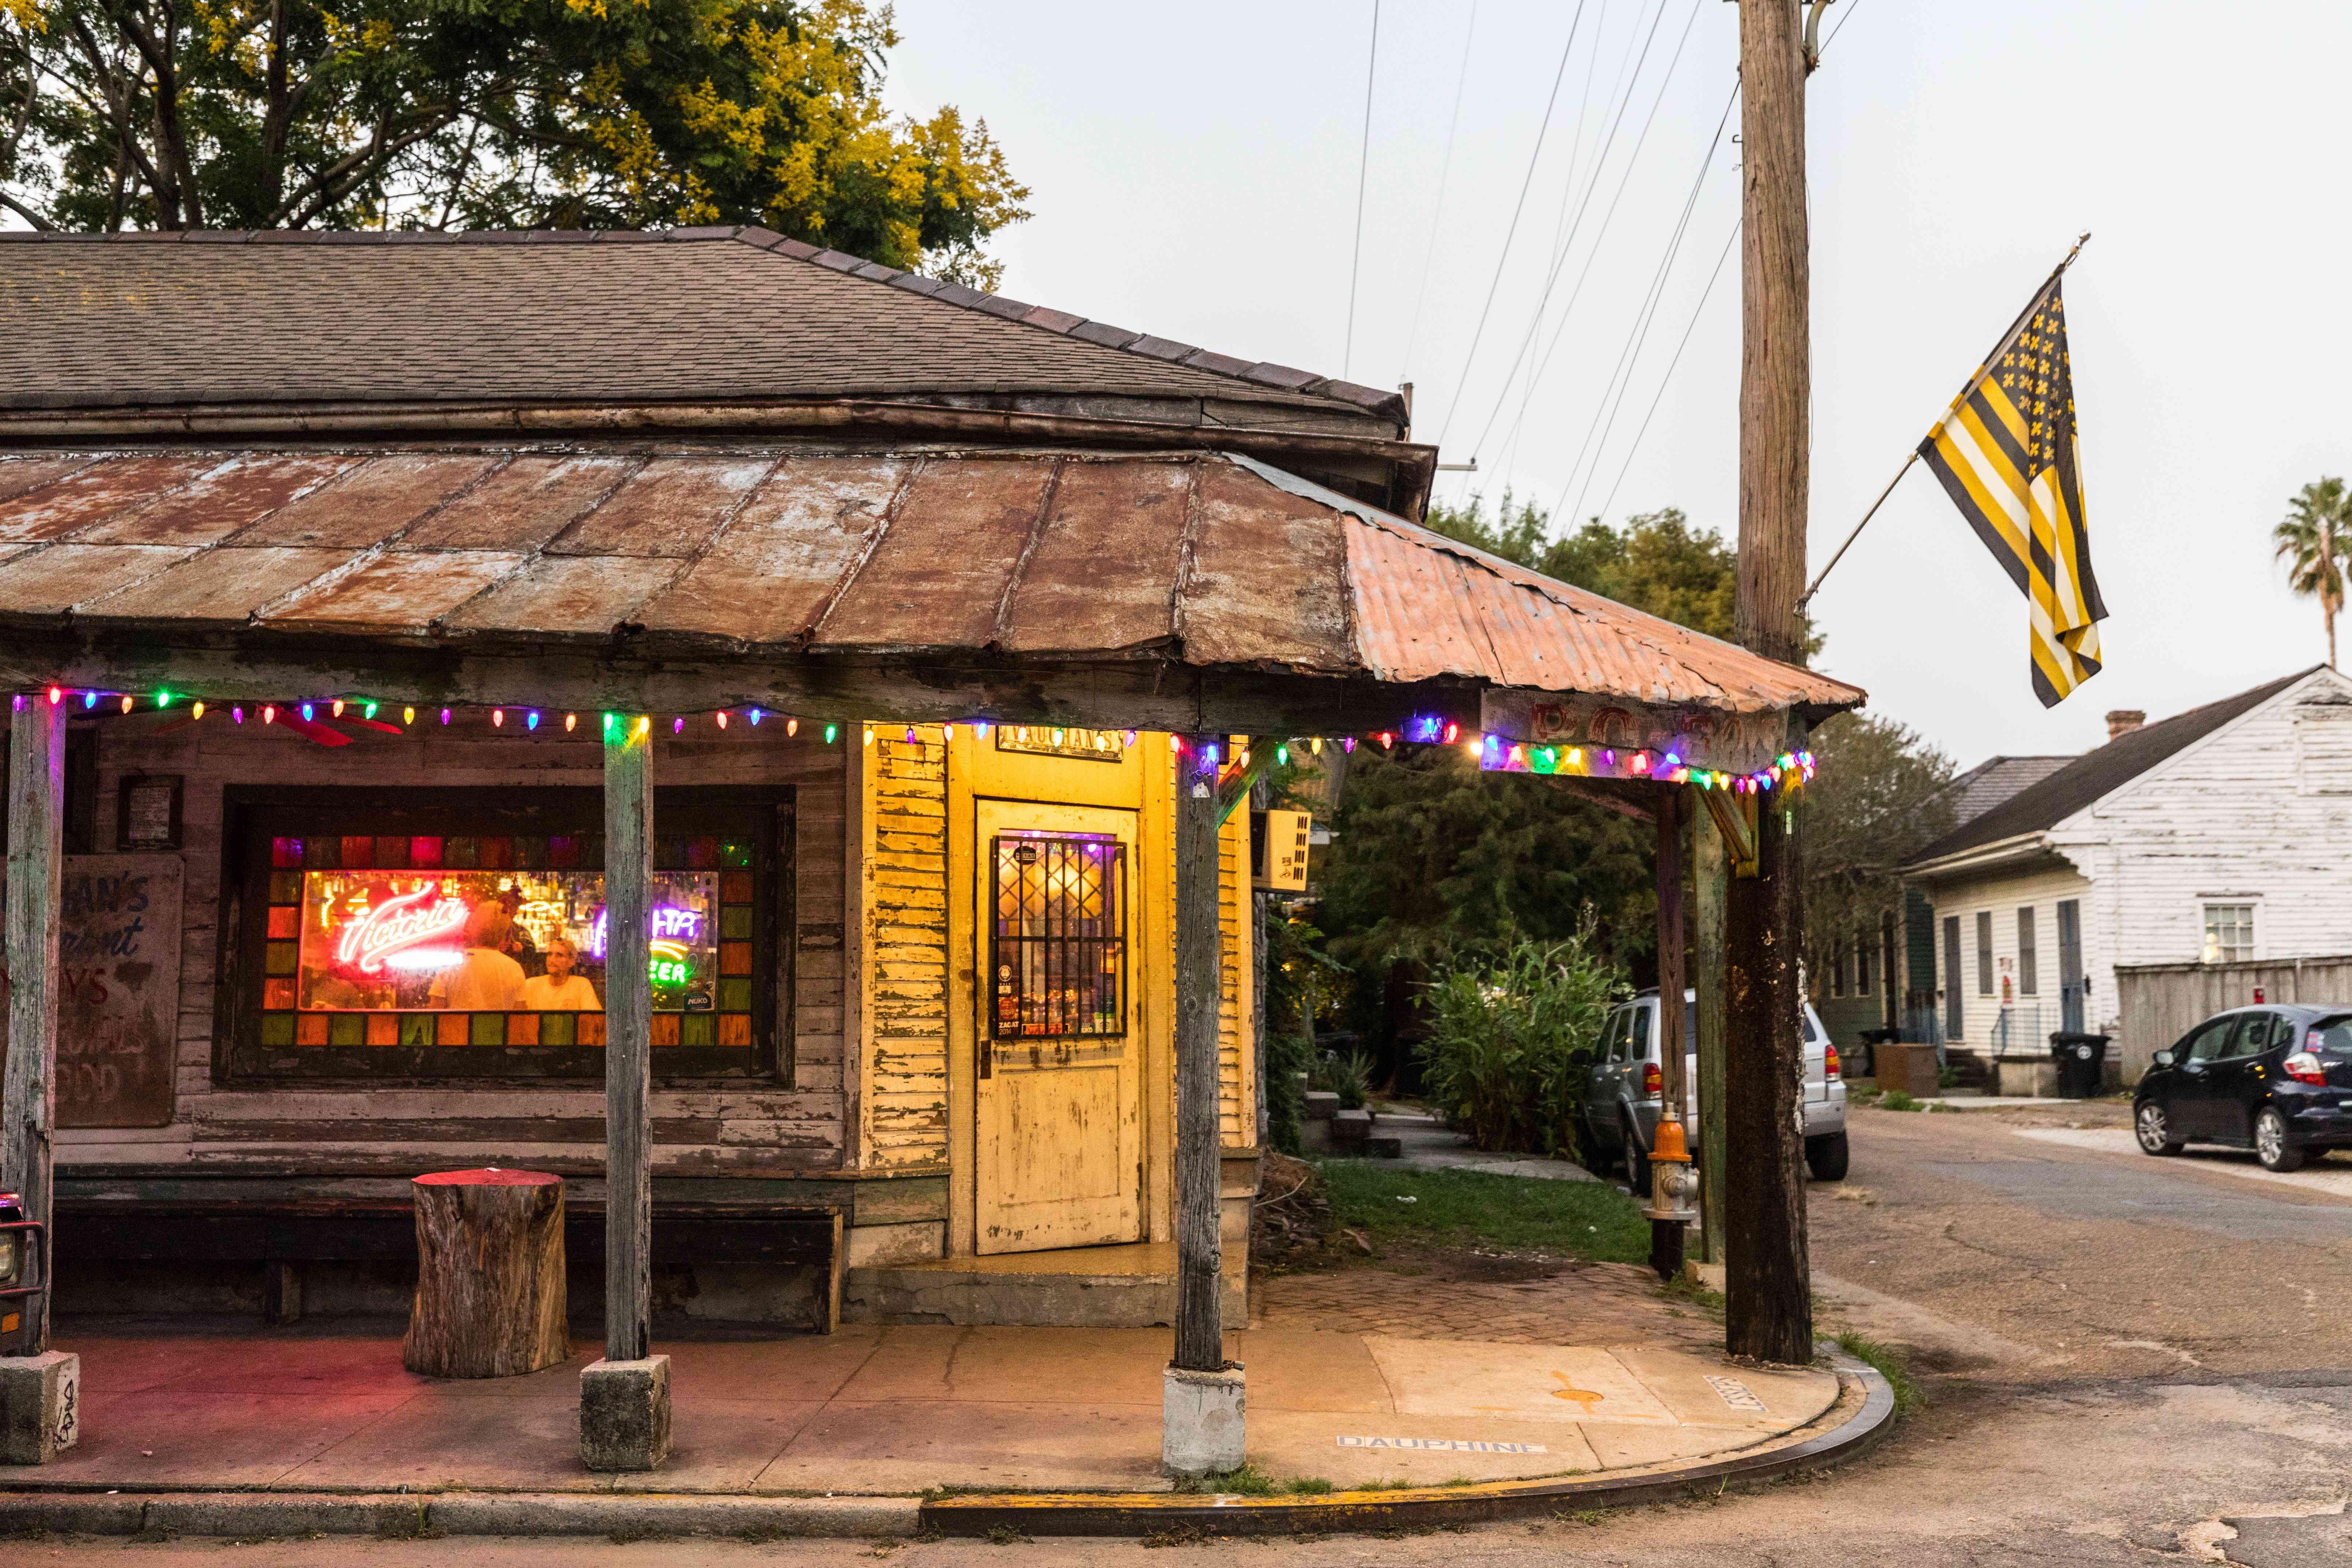 A corner in the Marigny neighborhood of New Orleans